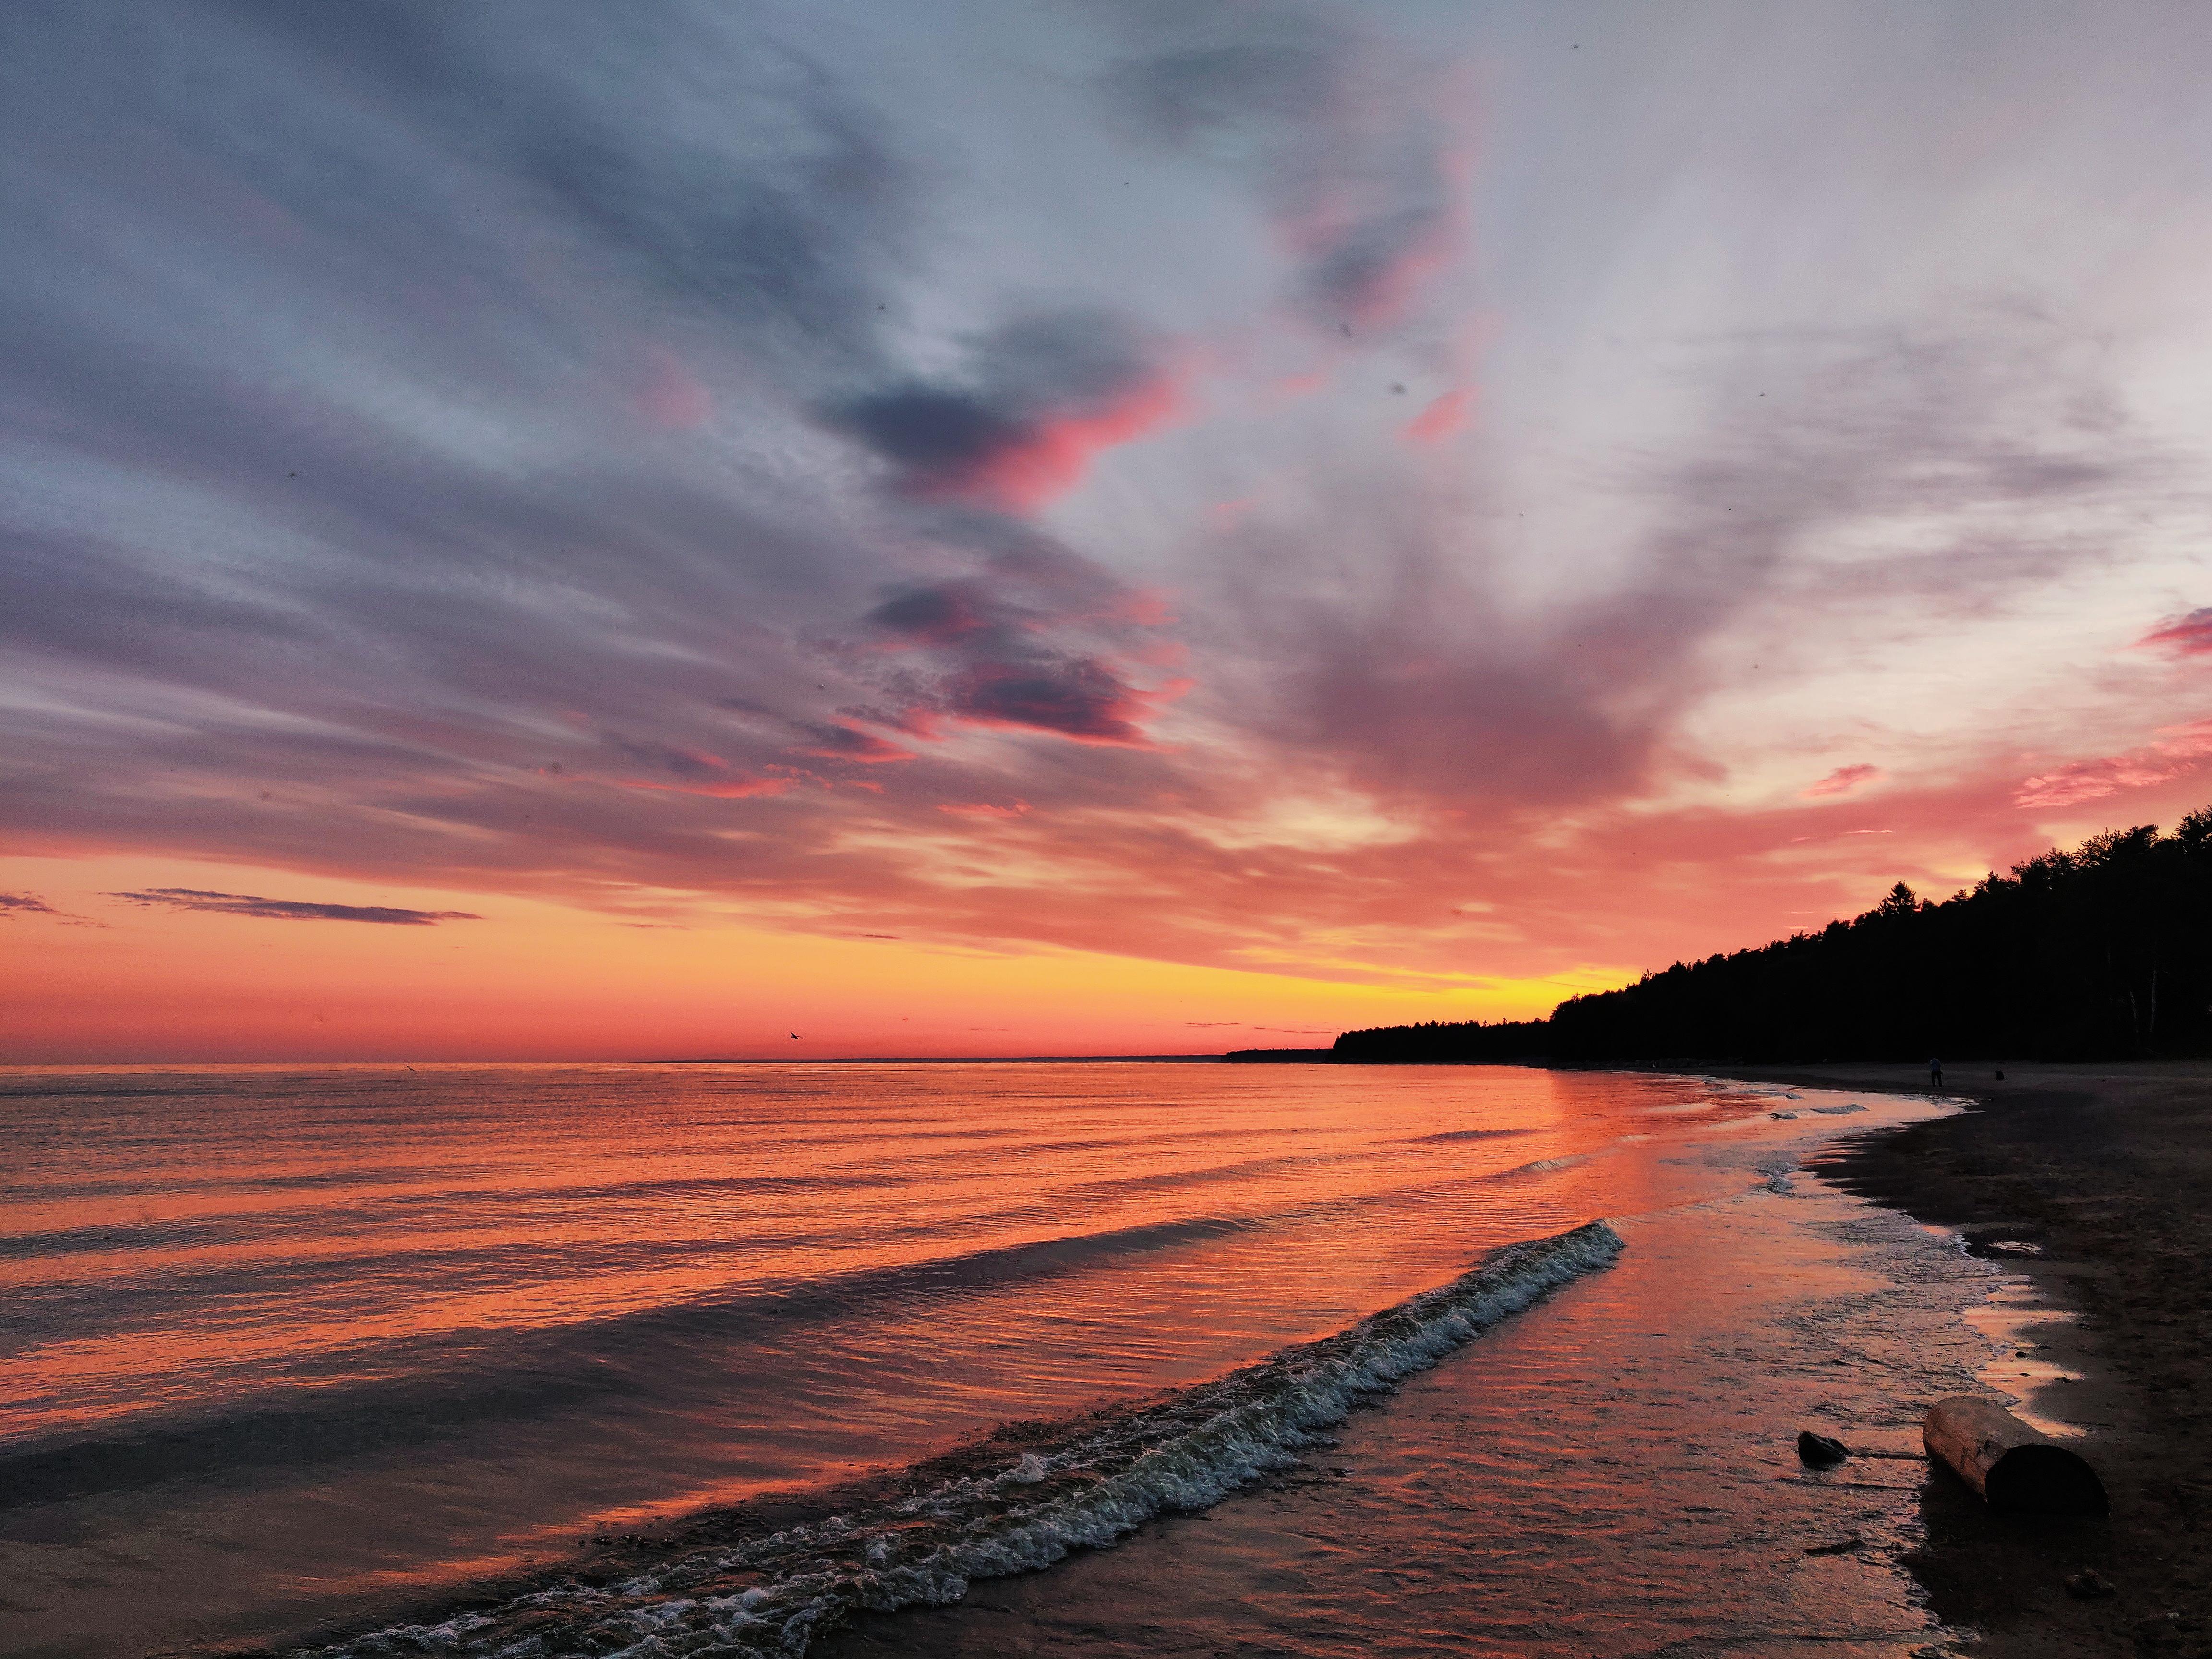 landscape beach evening 1574937852 - Landscape Beach Evening -